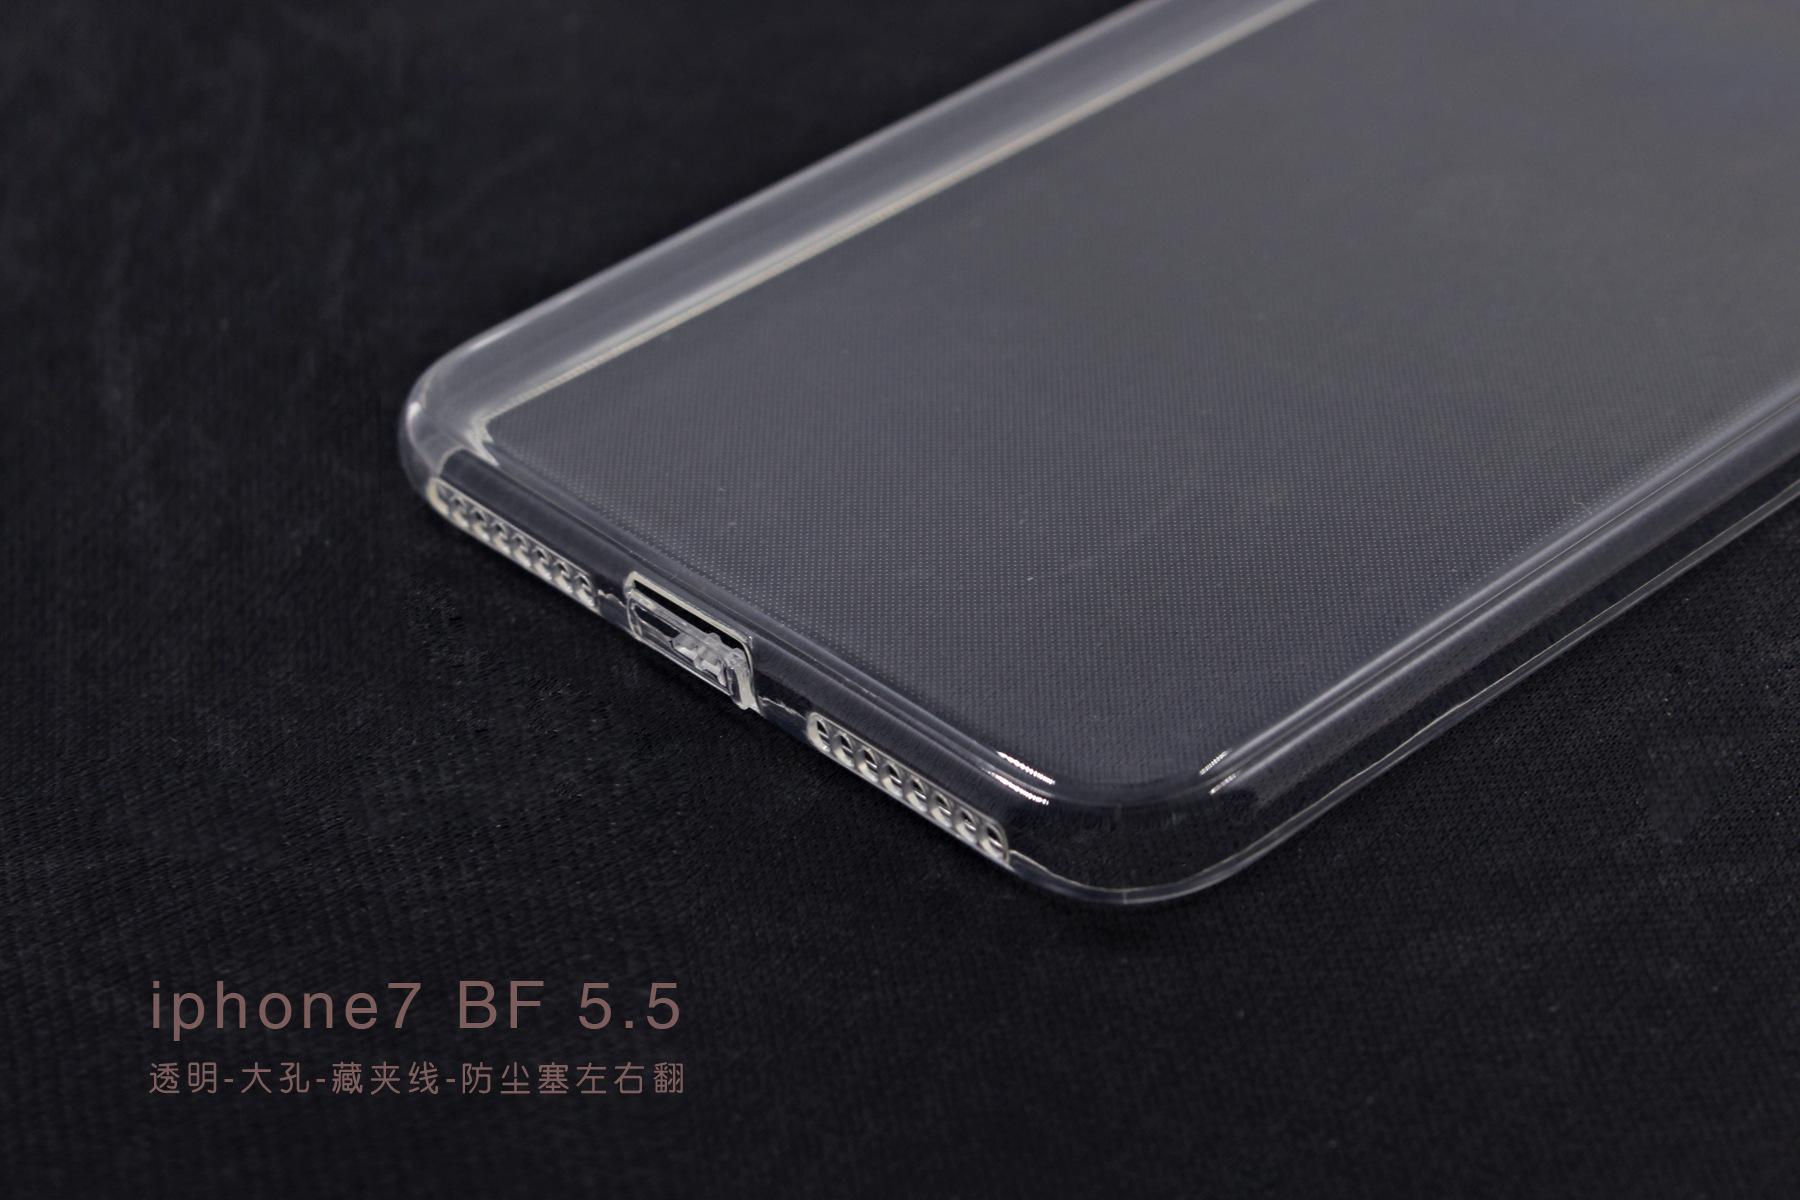 Case iphone 7 4.7 นิ้ว ขอบยาง หลังแข็ง ใส จุกกันฝุ่น